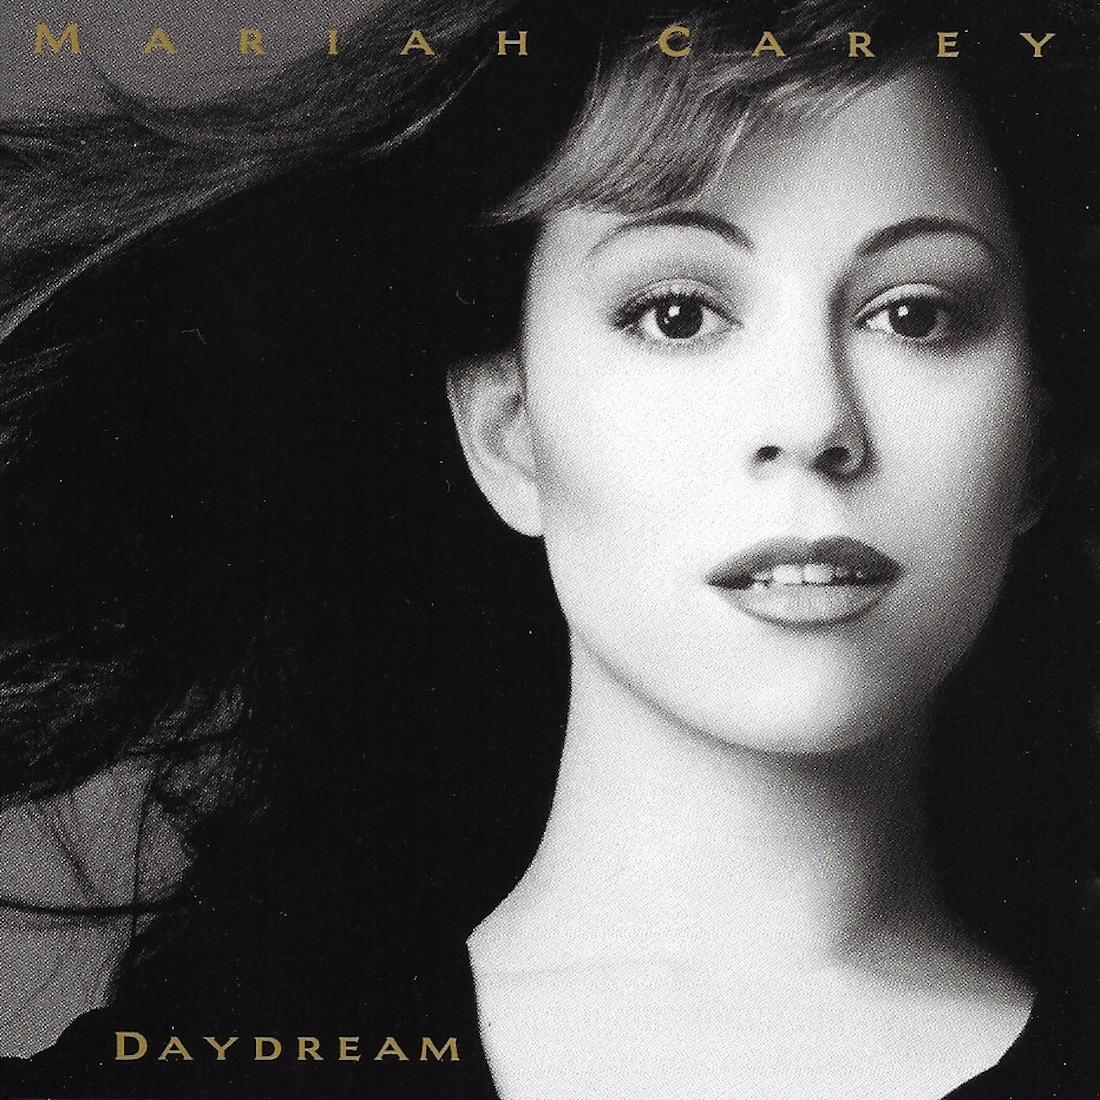 Mariah Carey's 1995 'Daydream' album